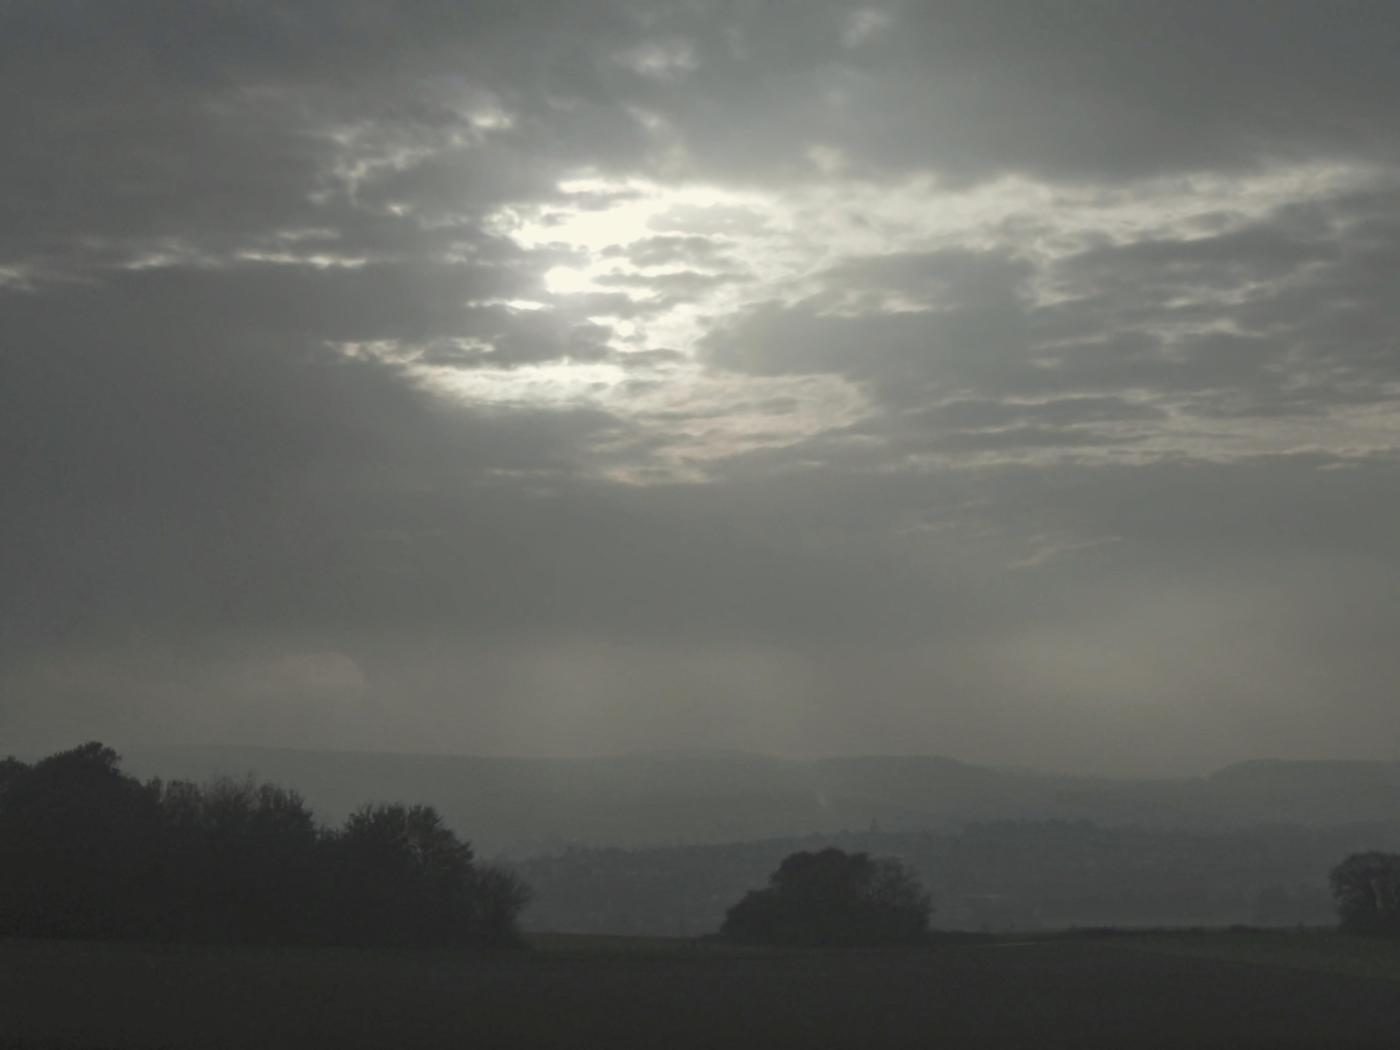 autaugaville landscape